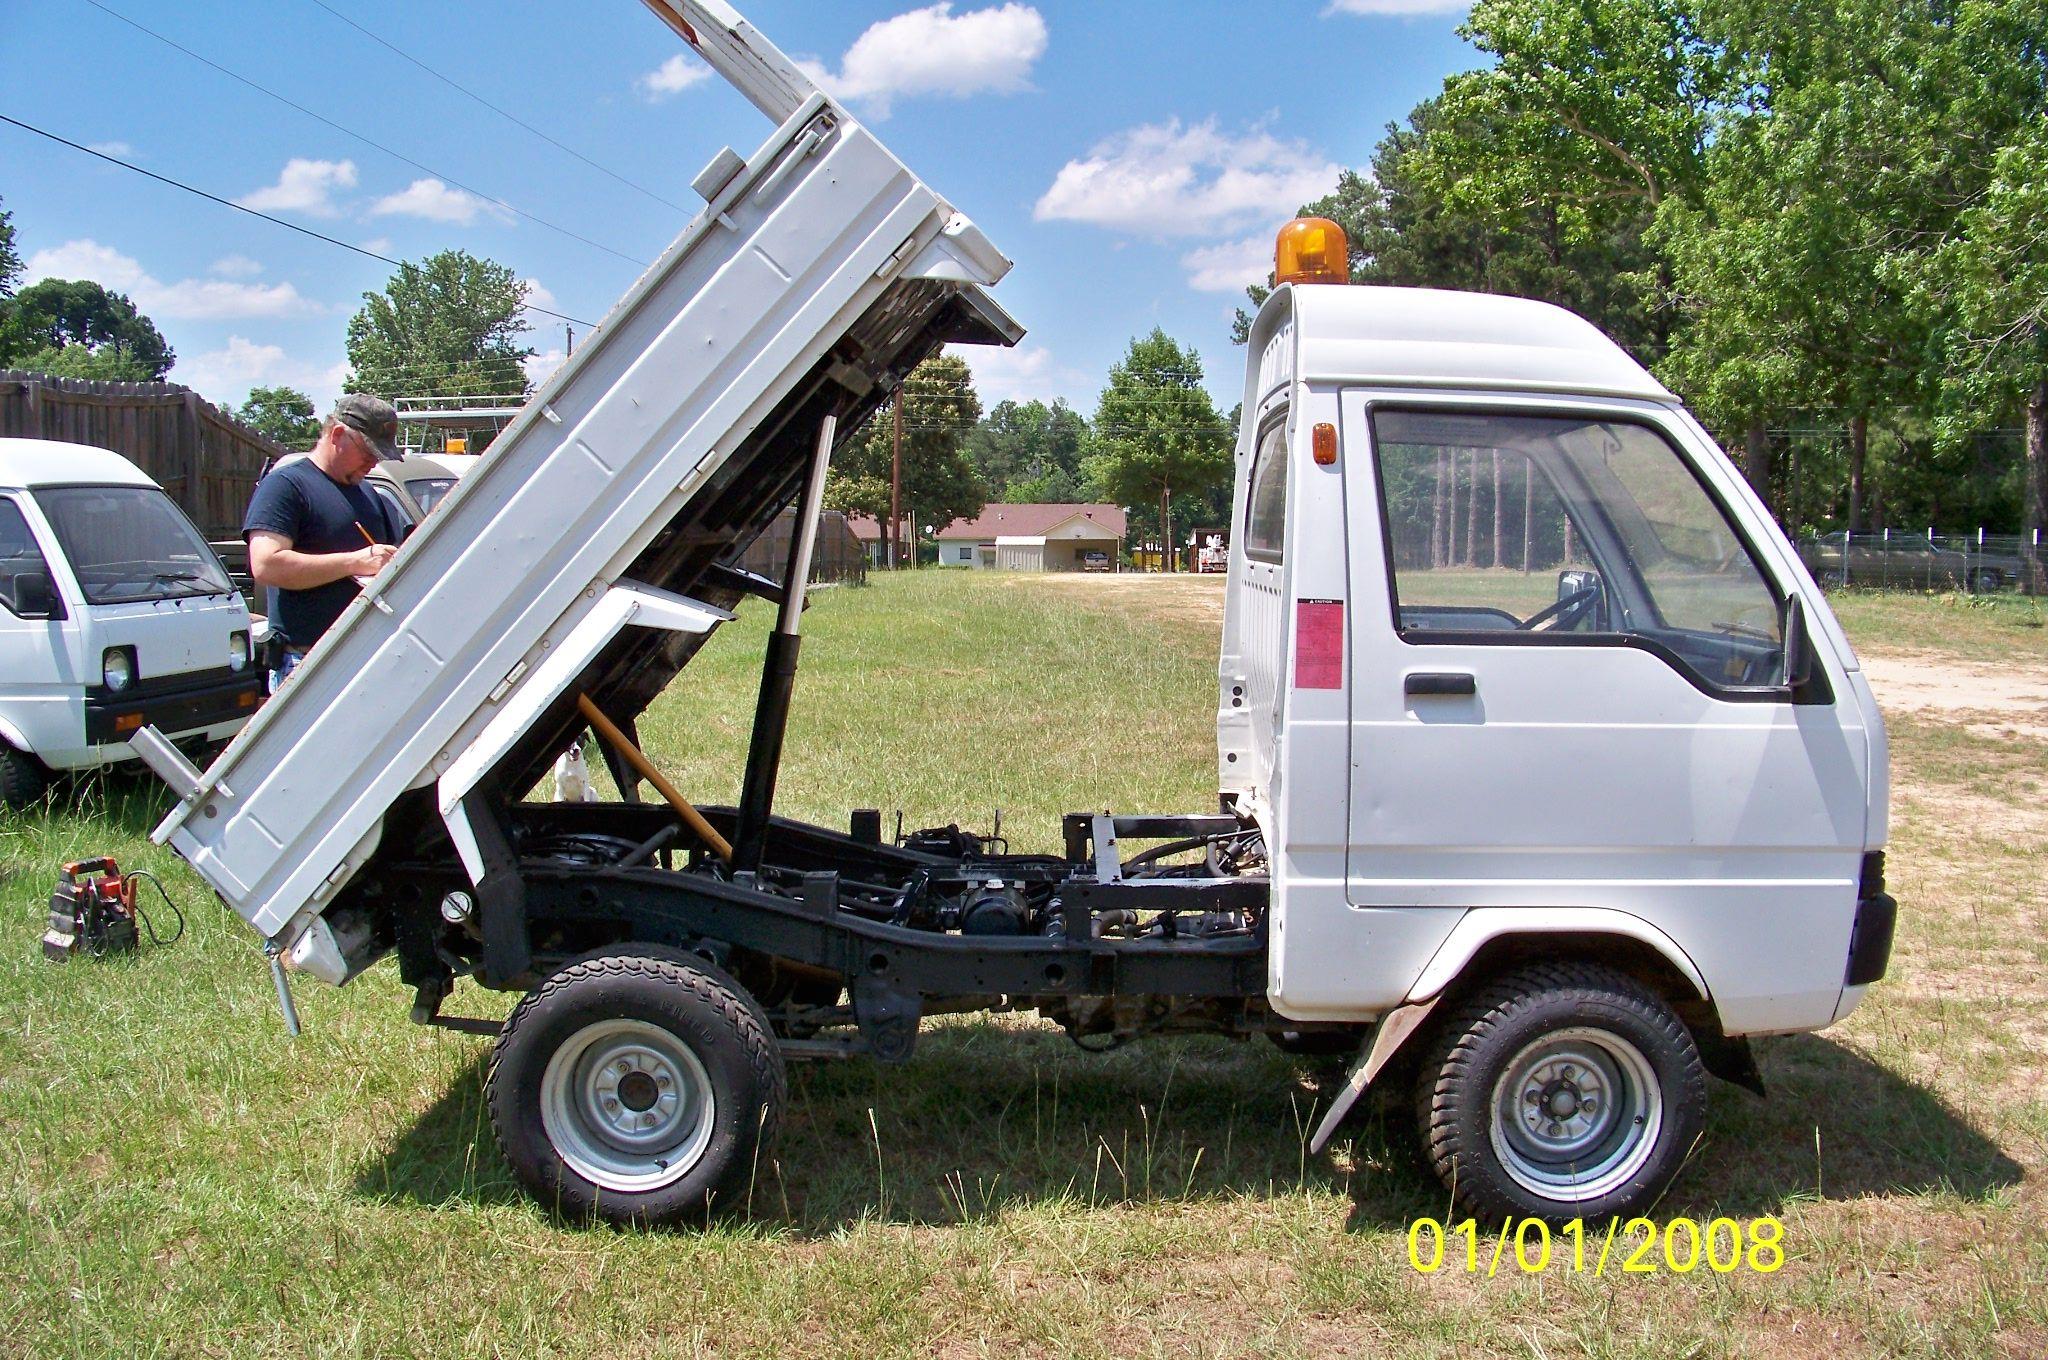 1994 MITSUBISHI MINI CAB LEFT HAND DRIVE DUMP | Farm Stuff | Pinterest